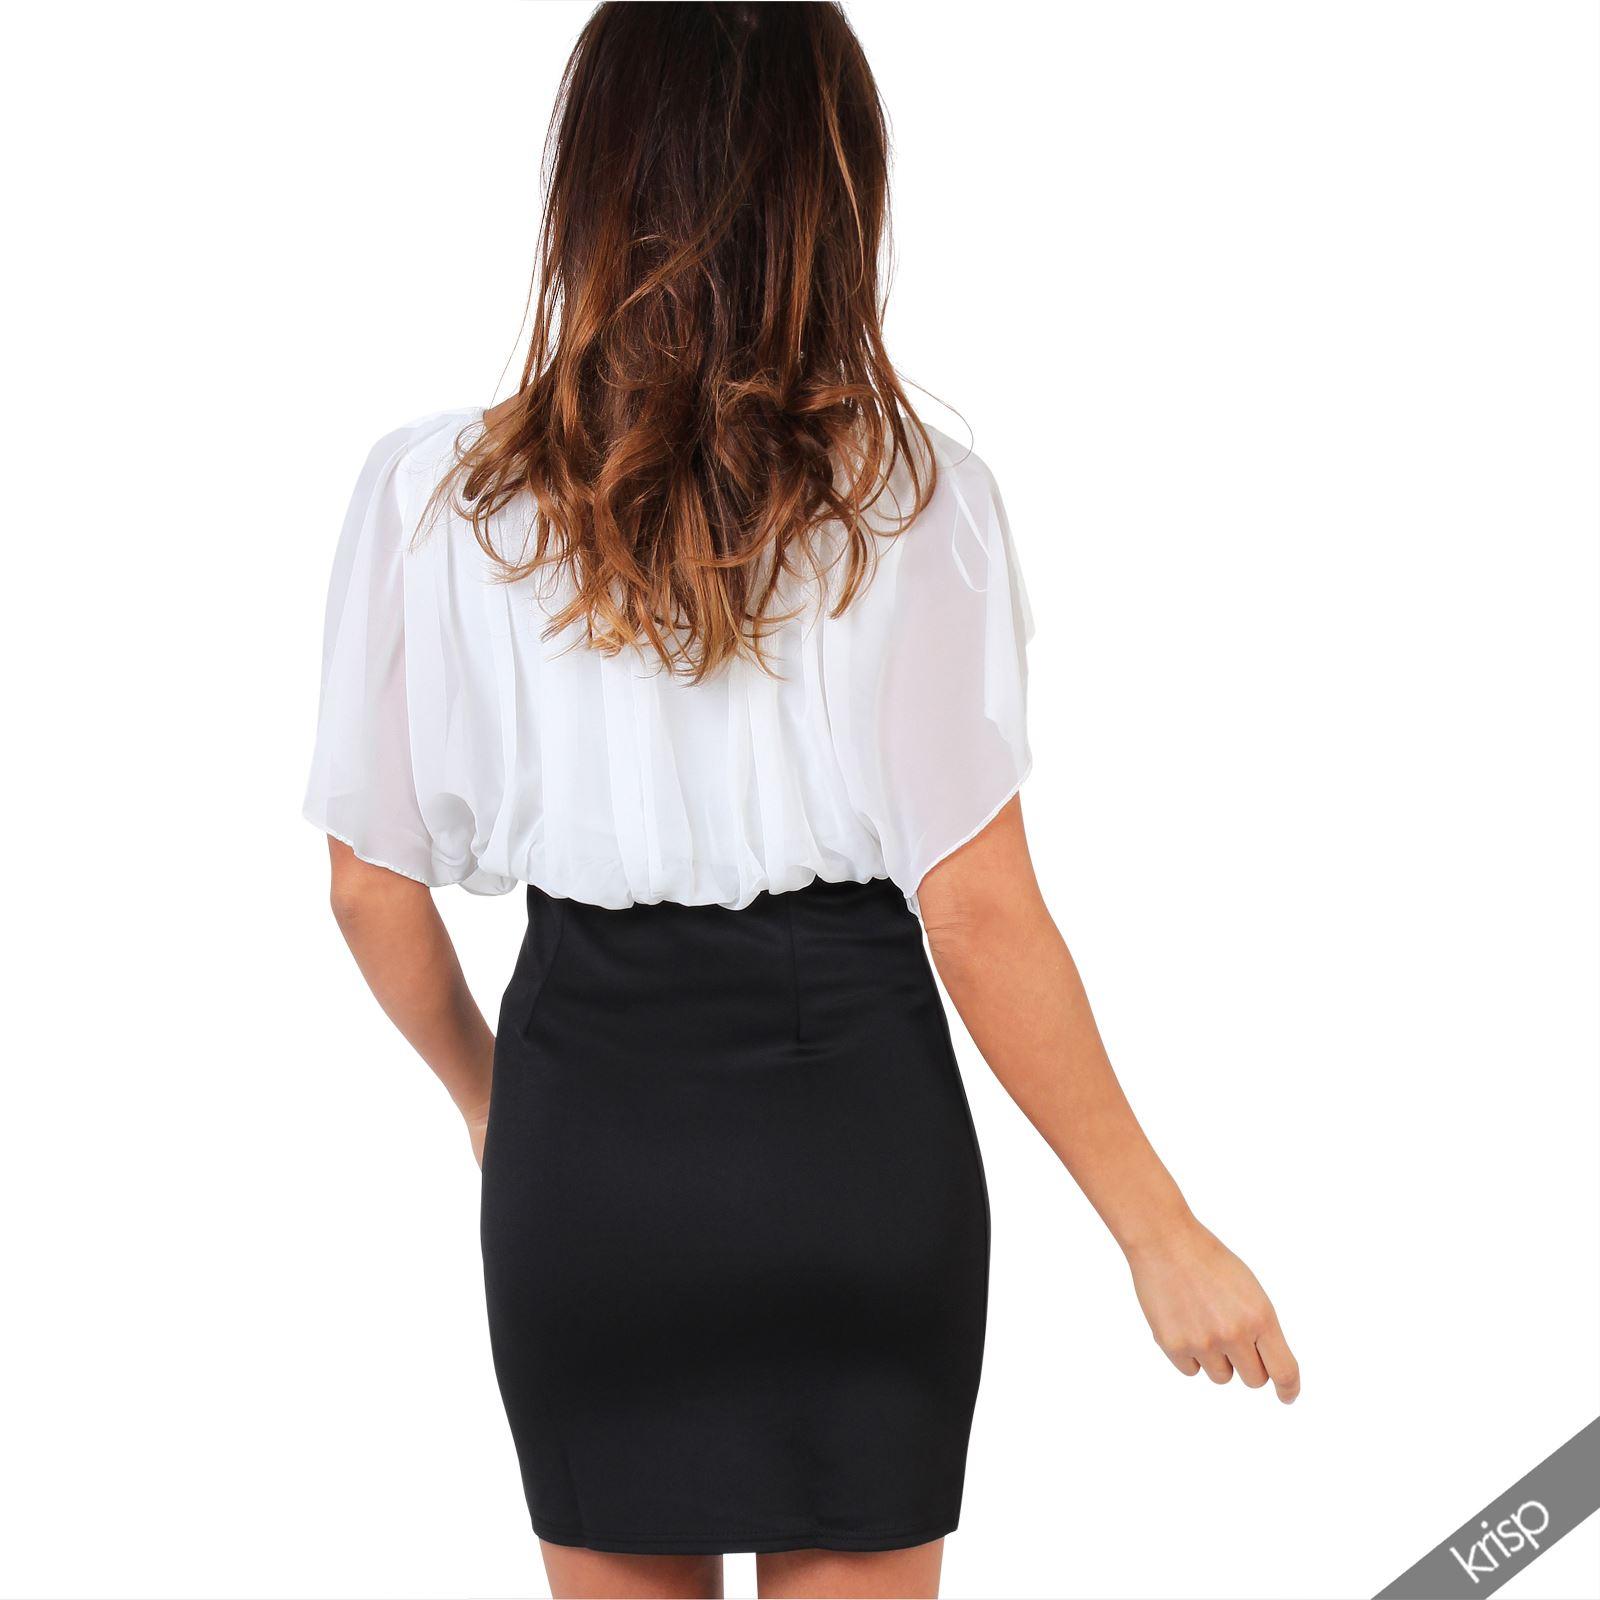 Womens-Pleated-Chiffon-Batwing-Top-High-Waist-Pencil-Bodycon-Skirt-Mini-Dress thumbnail 15